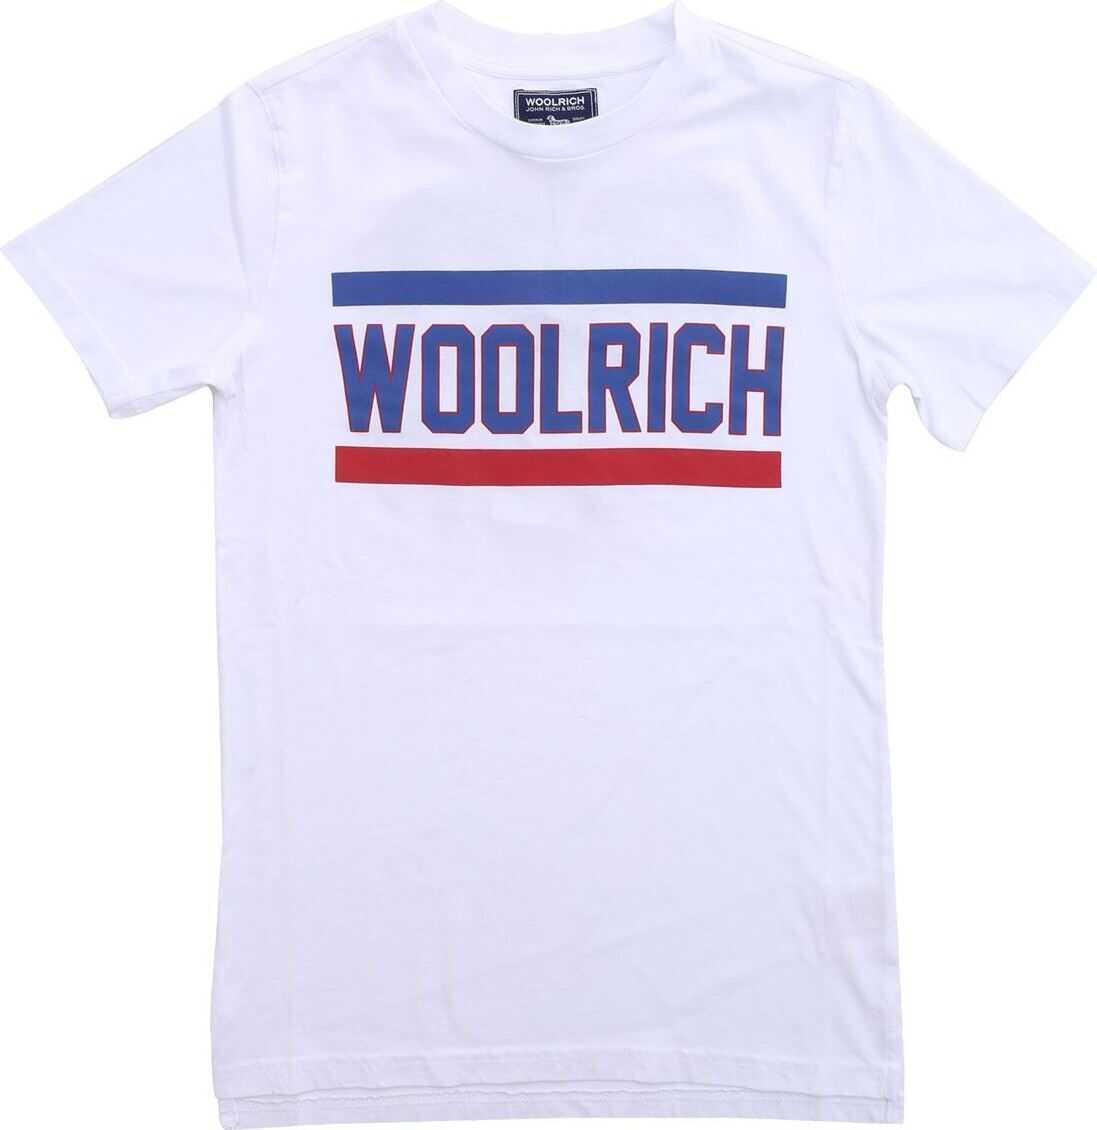 Woolrich T-Shirt In White